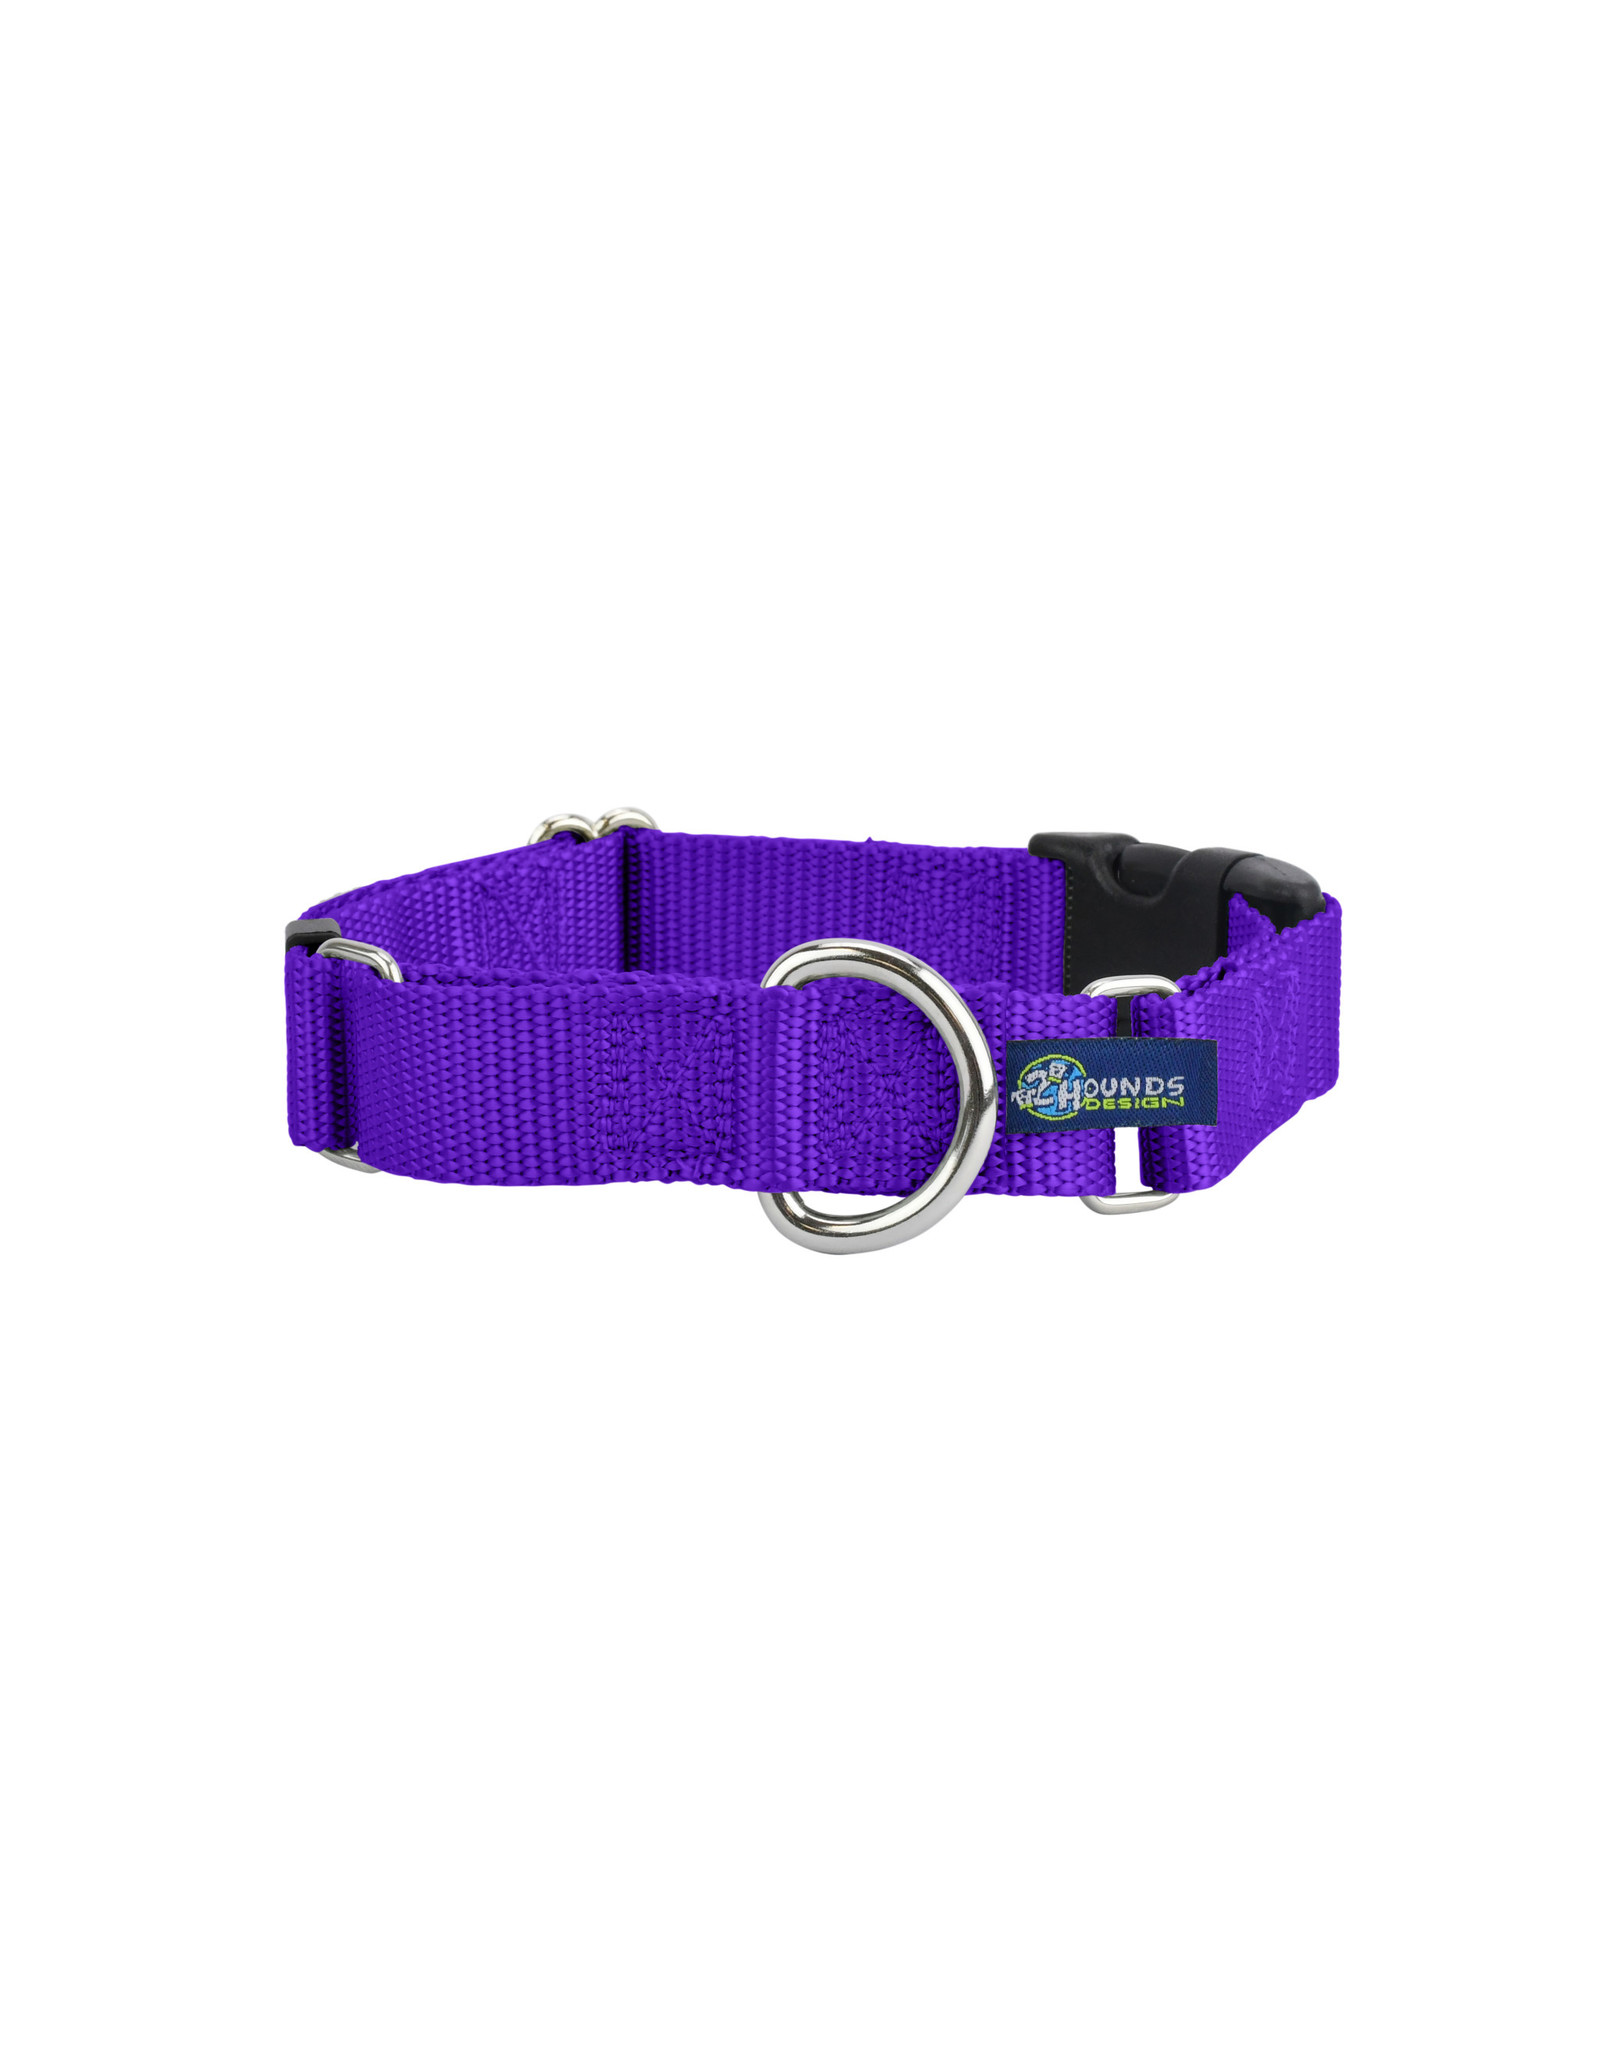 "2 Hounds Design Martingale w/ buckle: Purple, 5/8"" M"